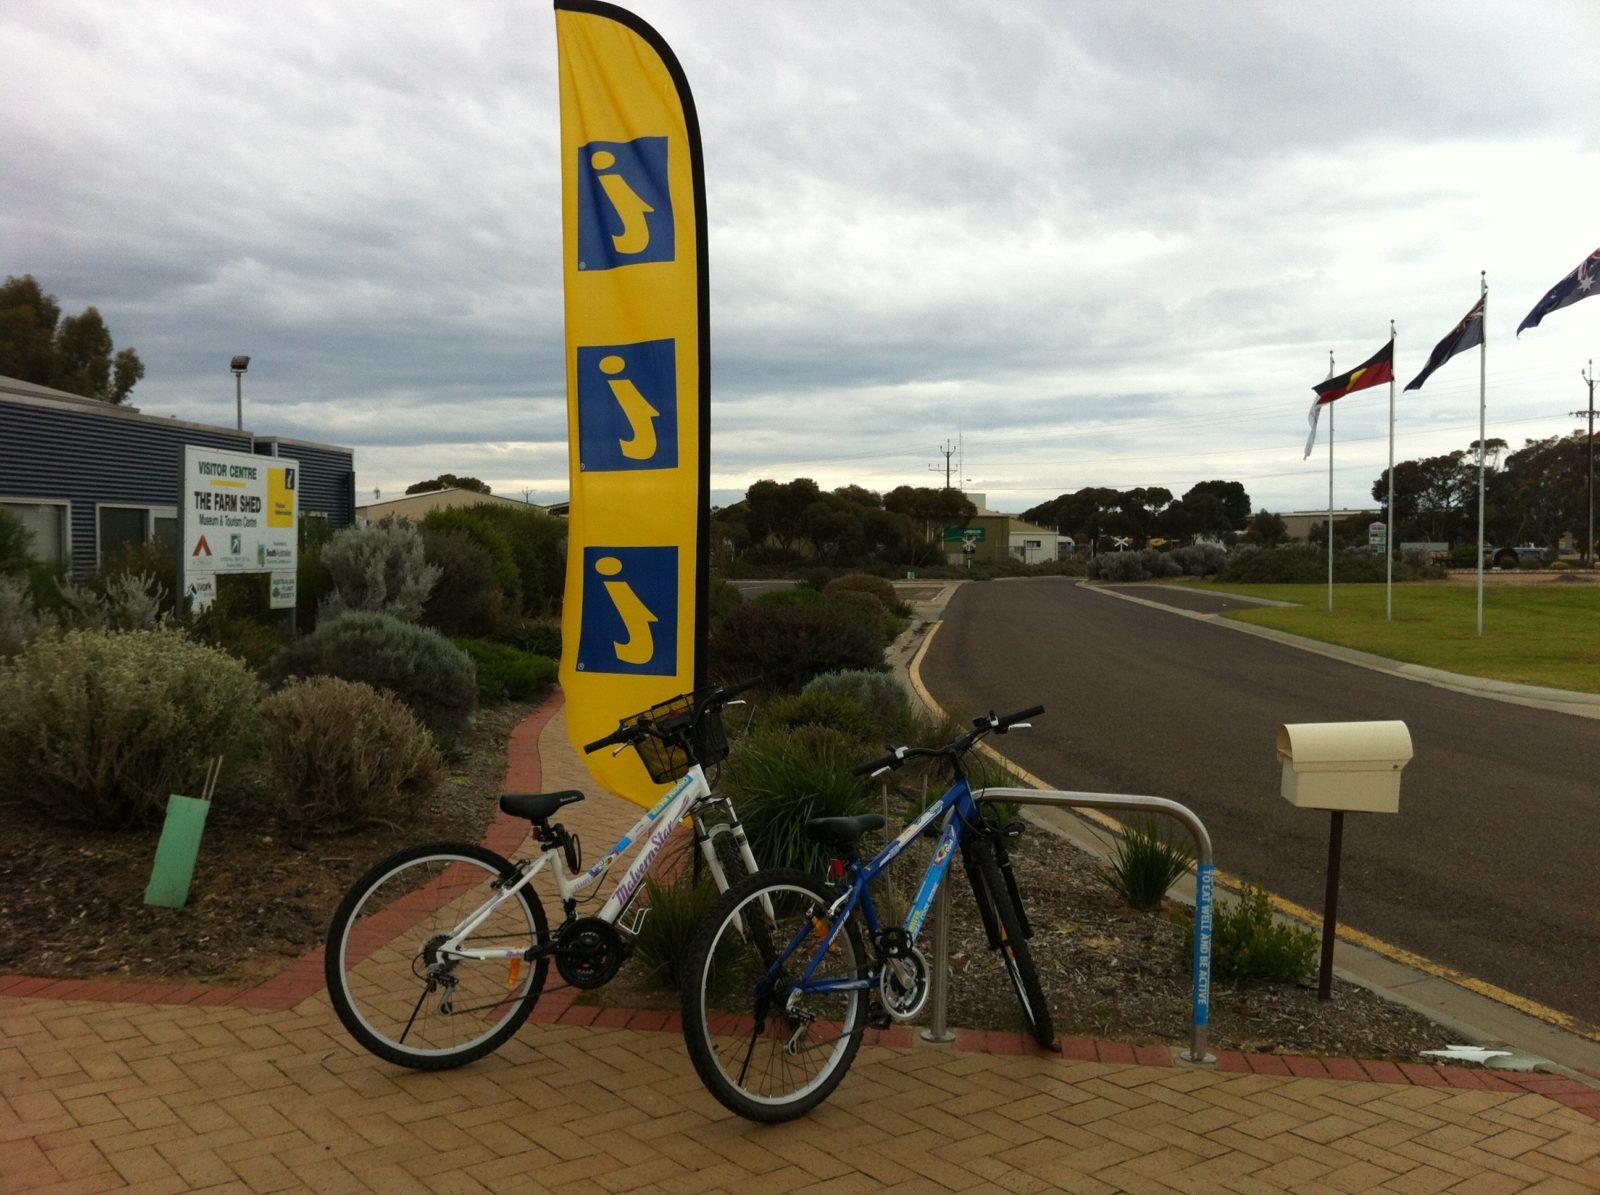 OPAL Bike Hire, Kadina, Yorke Peninsula, South Australia